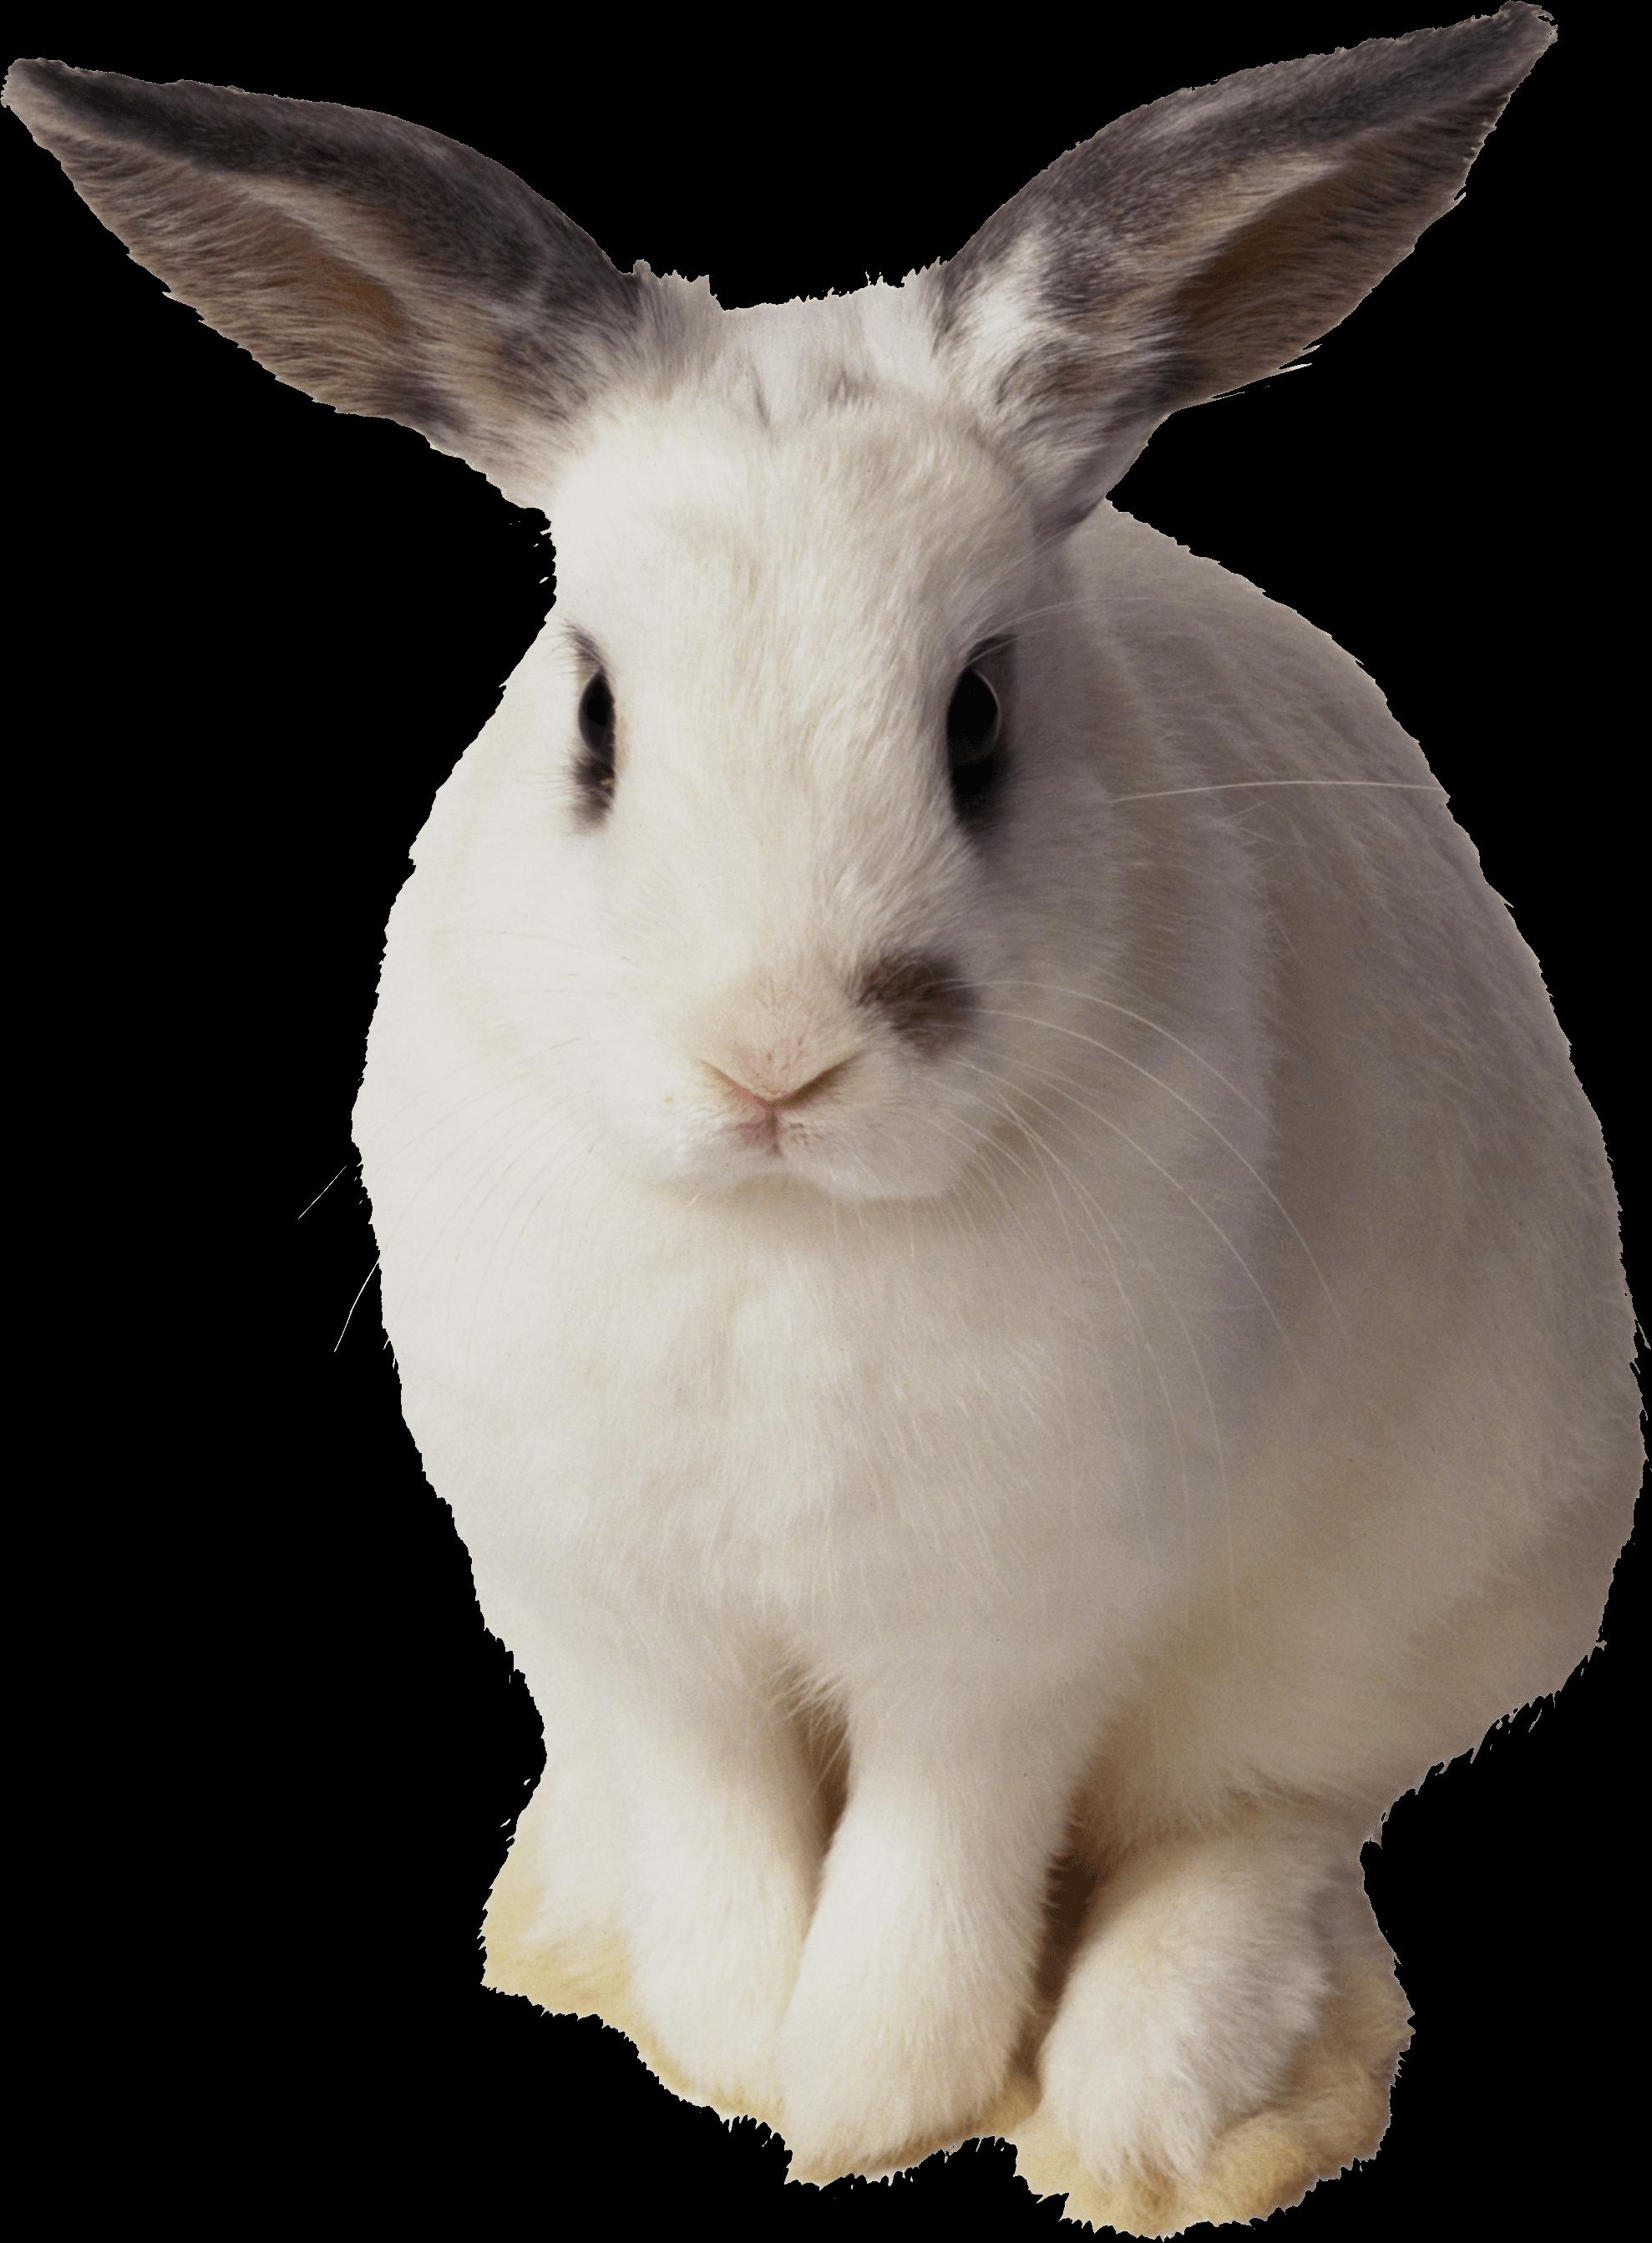 white rabbit sitting